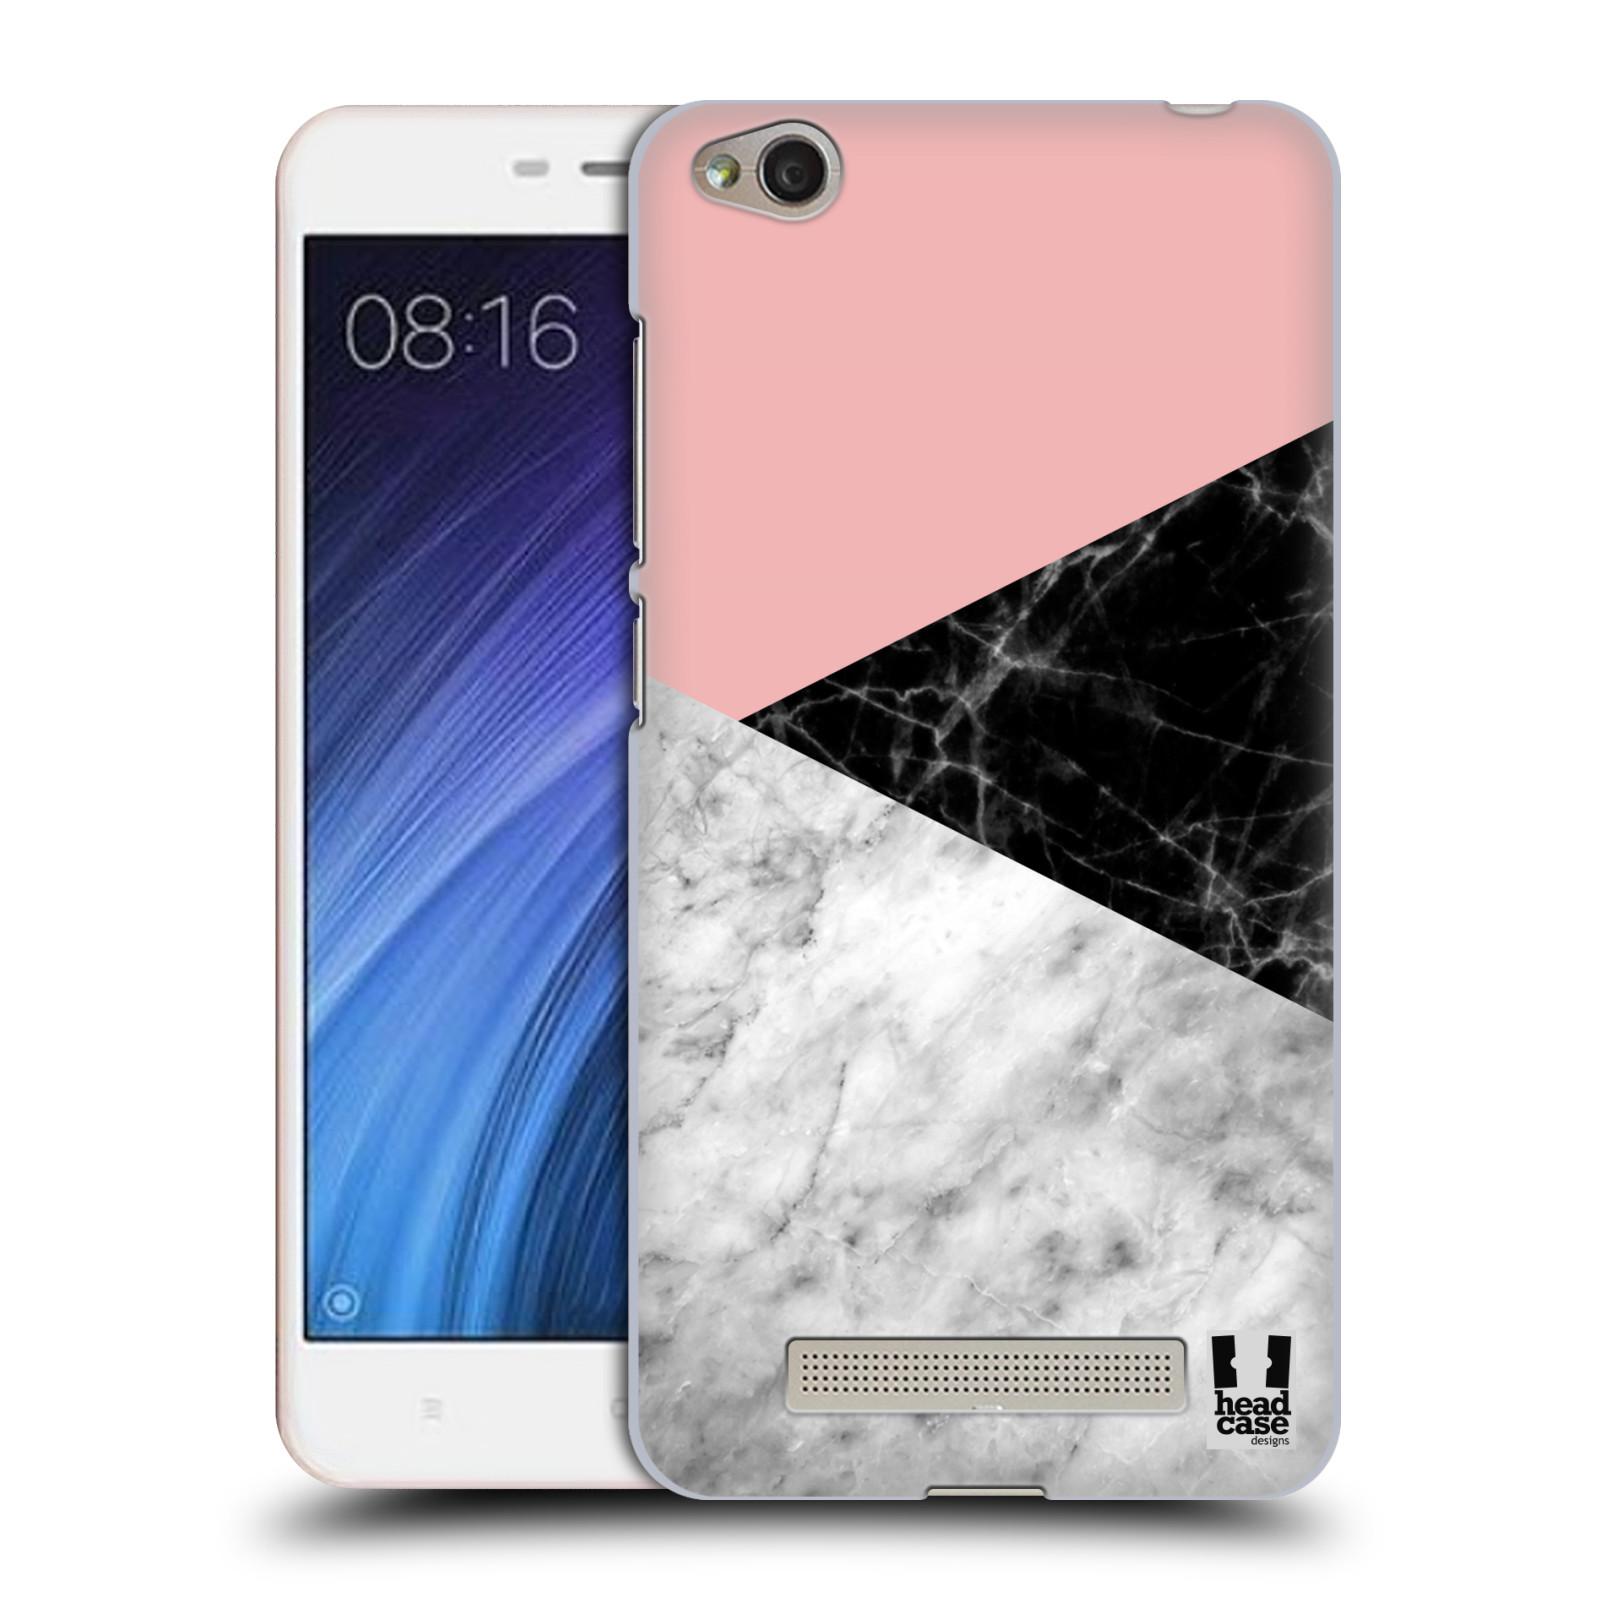 Plastové pouzdro na mobil Xiaomi Redmi 4A - Head Case - Mramor mix